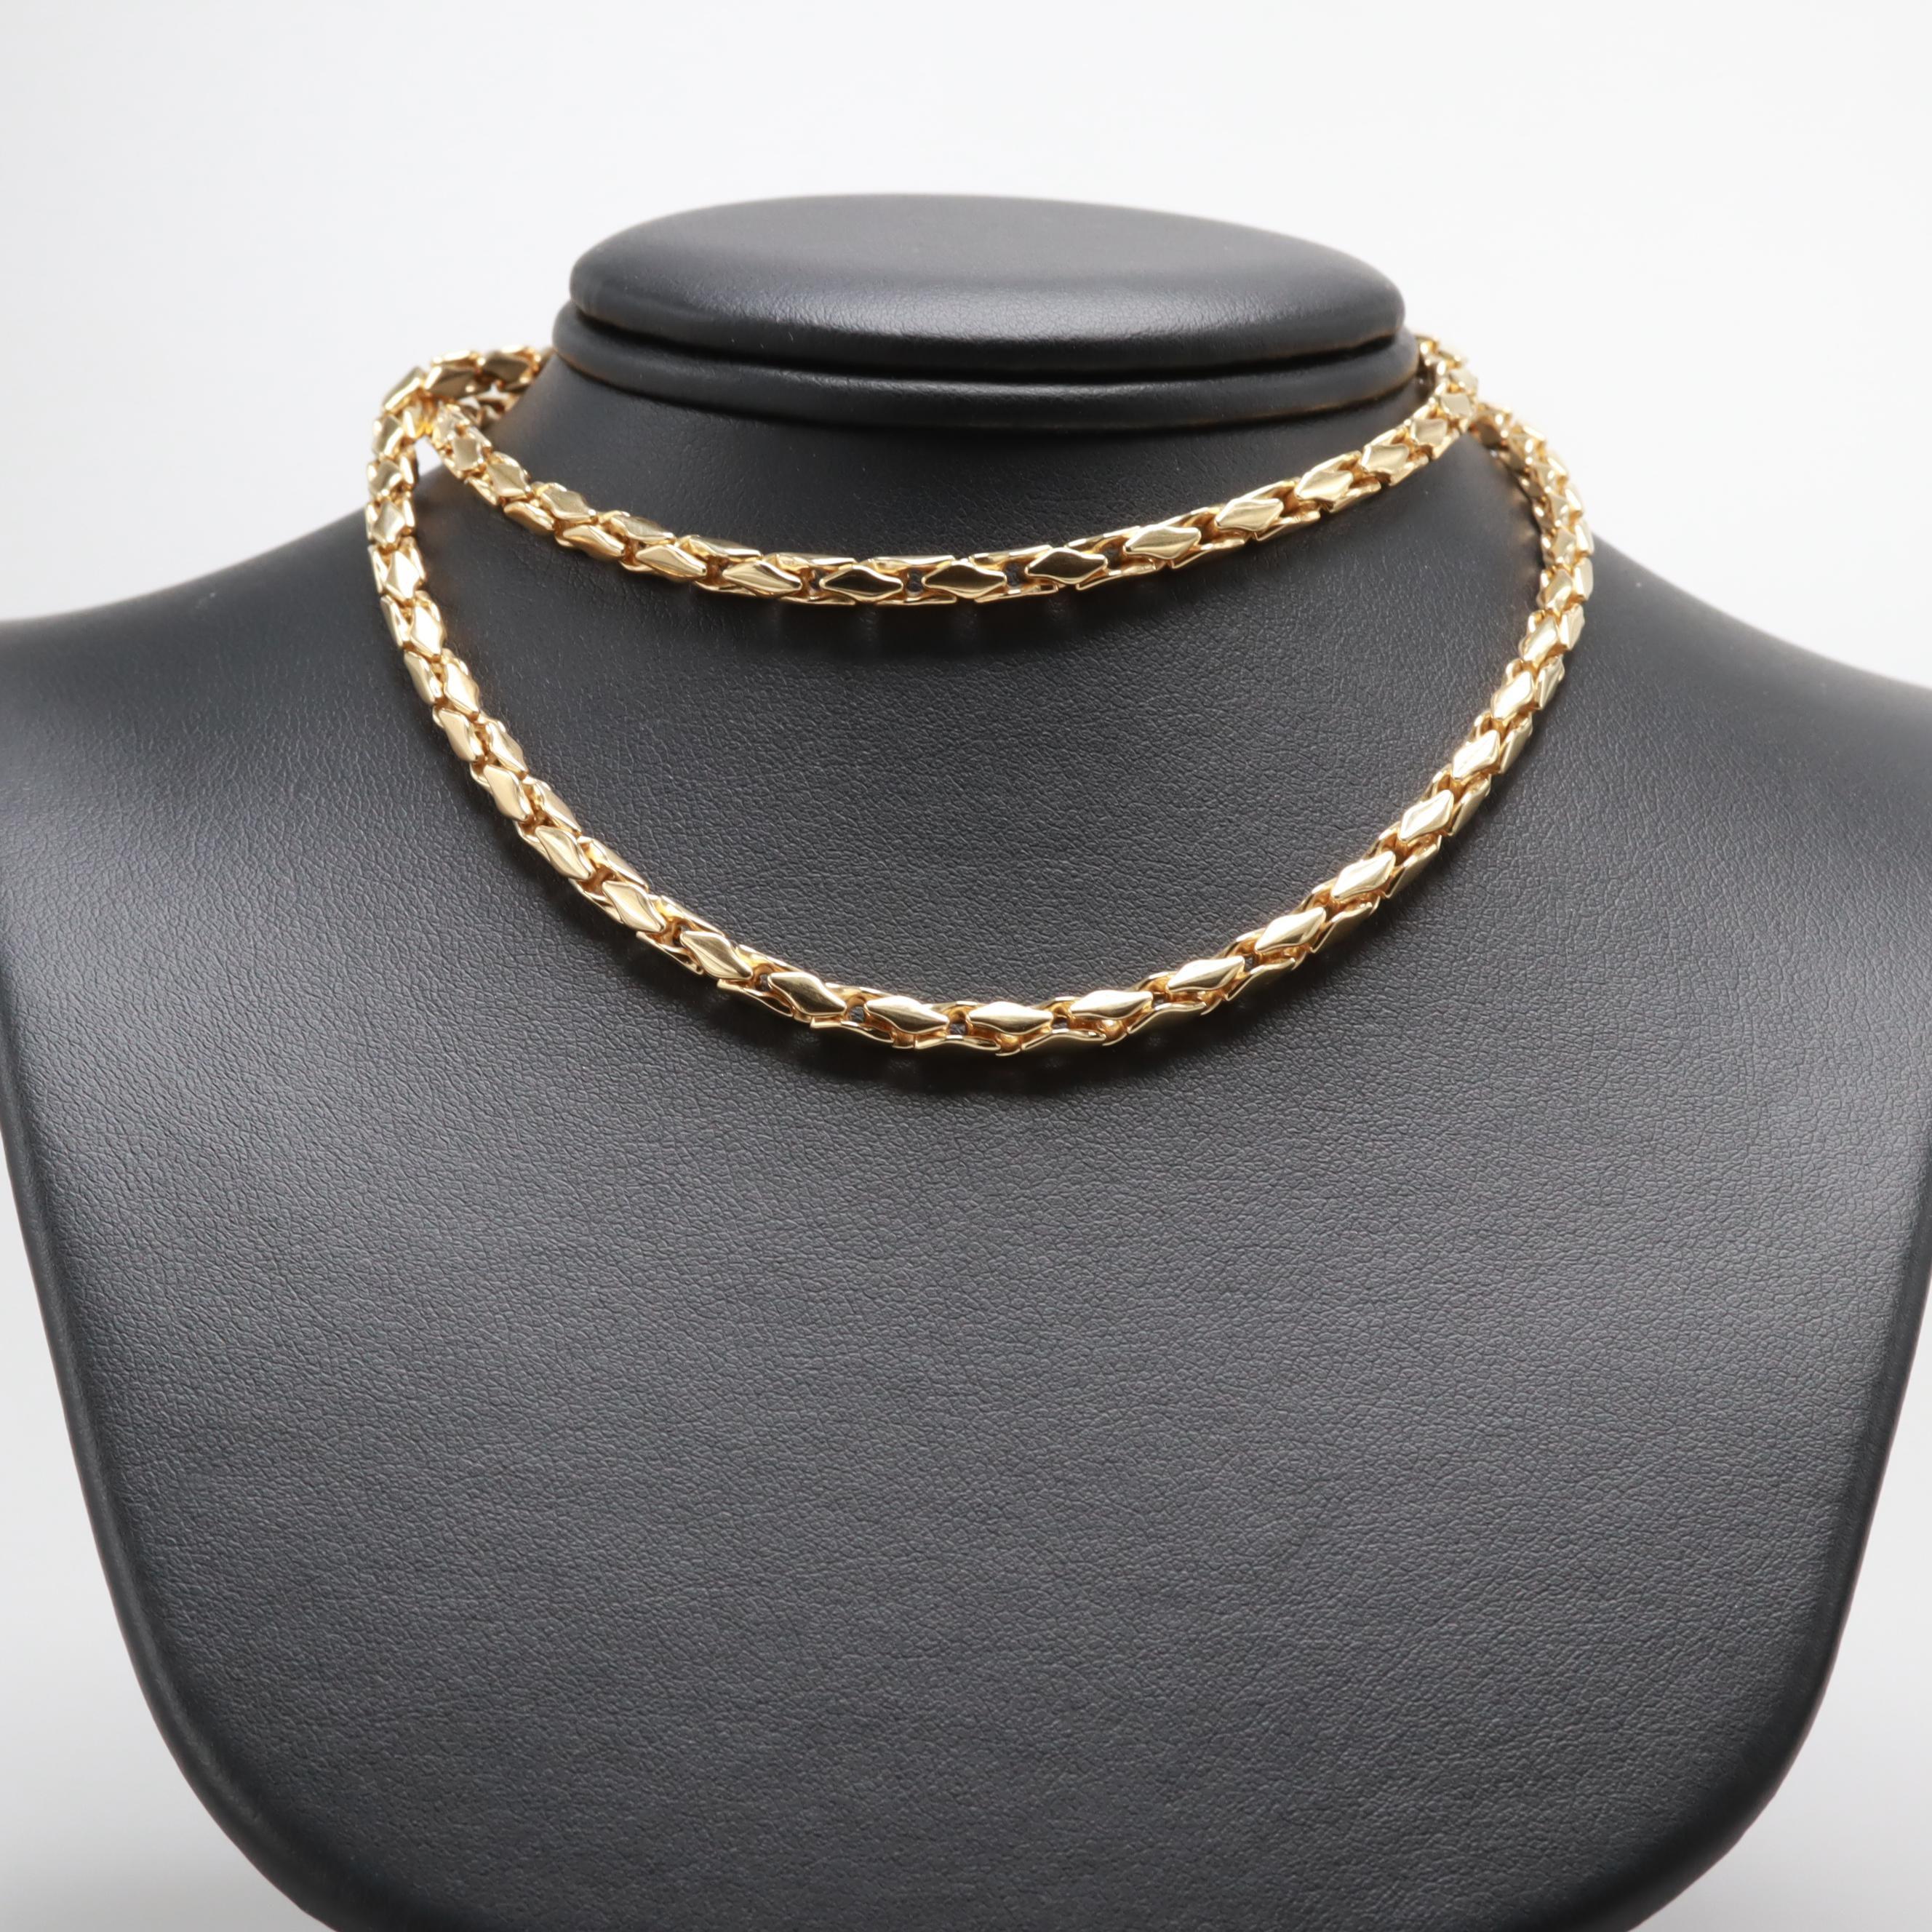 David Yurman 18K Yellow Gold Chain Necklace